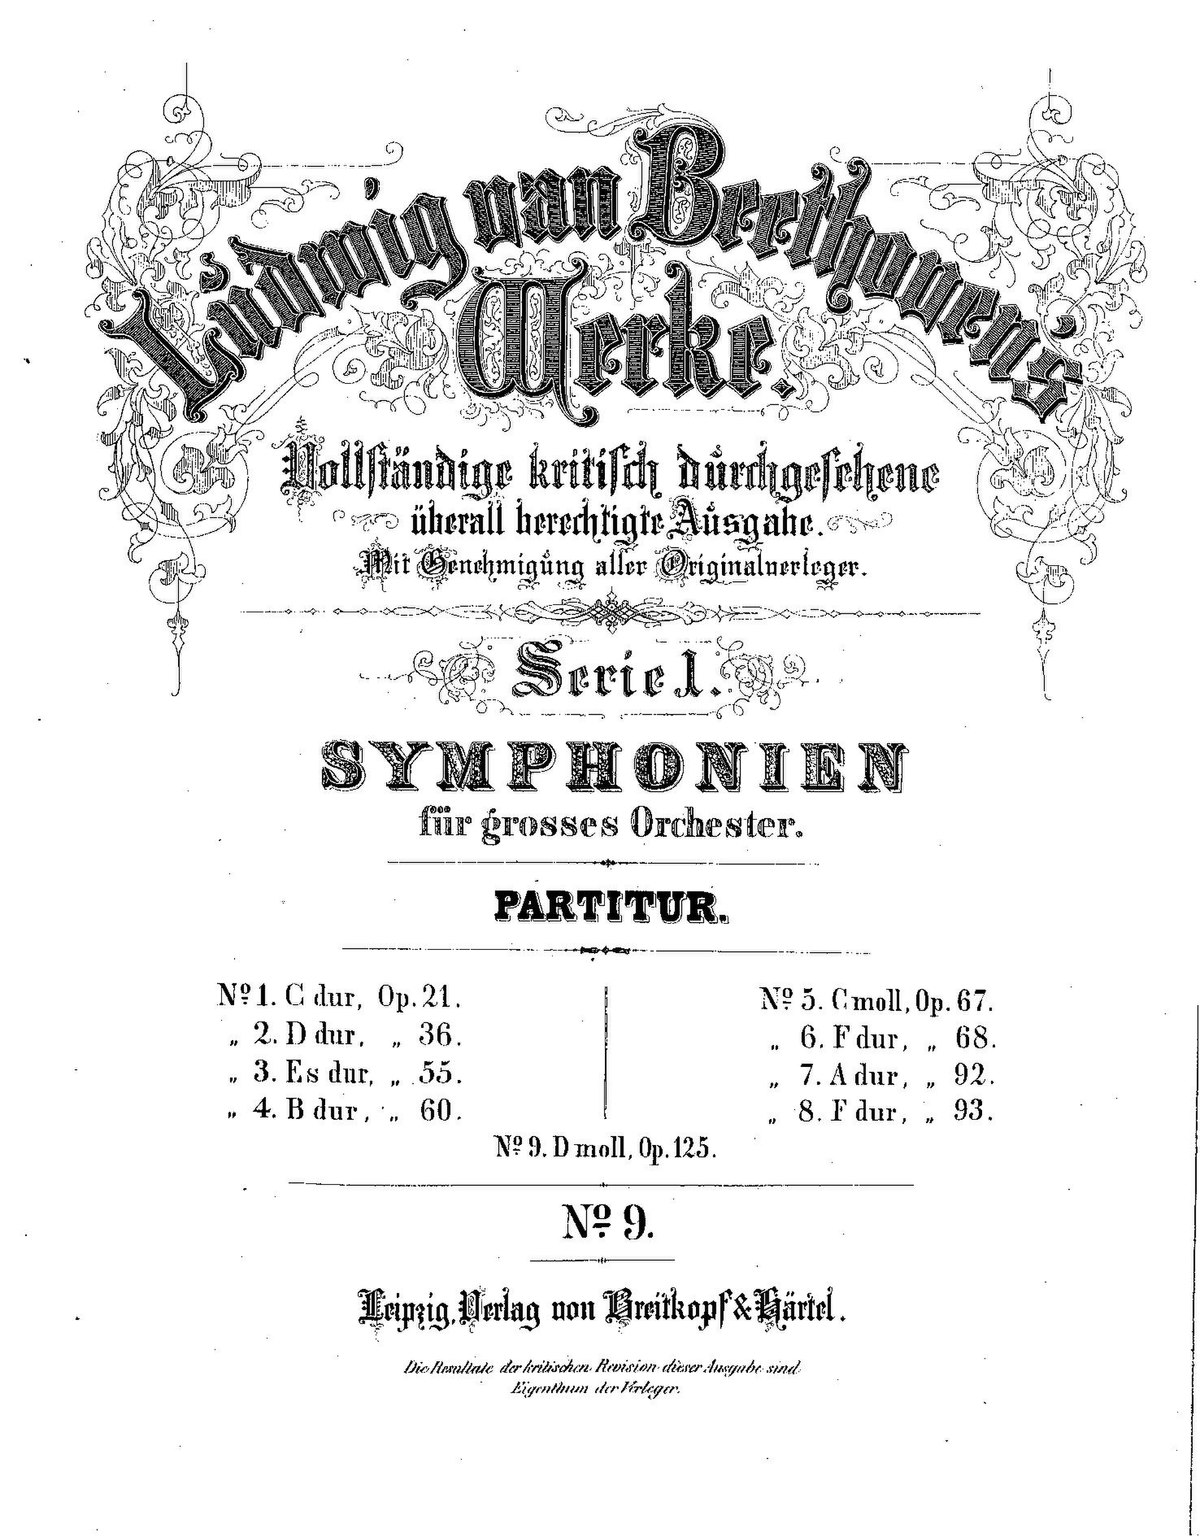 Beethoven violin sonata 4